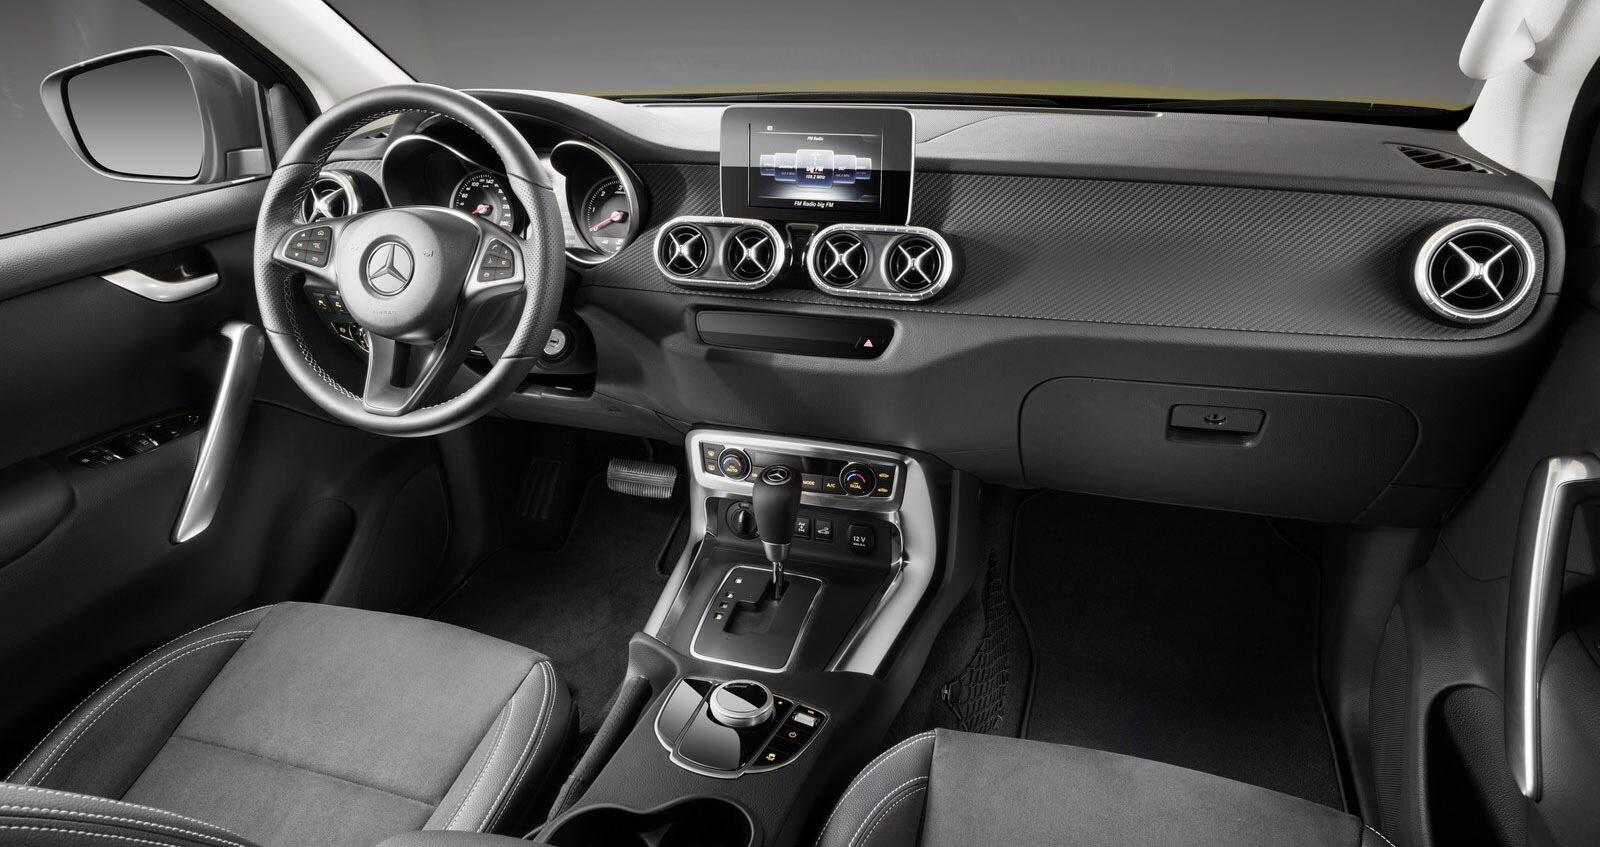 Ảnh chi tiết Mercedes-Benz X-Class - Hình 12